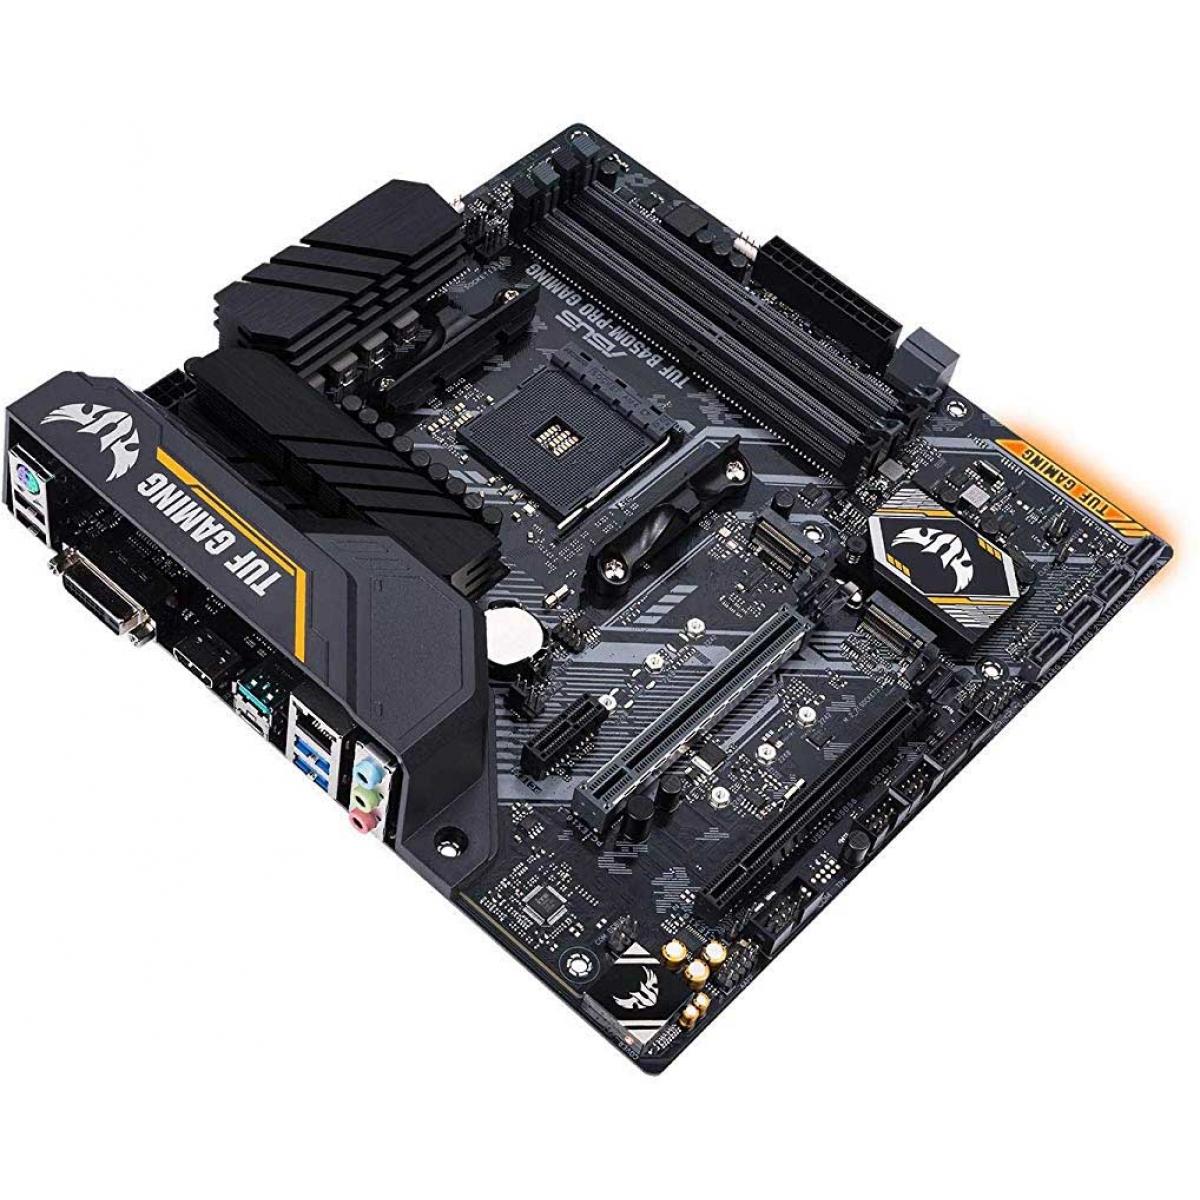 Placa Mãe Asus TUF B450M-PRO GAMING, Chipset B450, AMD AM4, mATX, DDR4